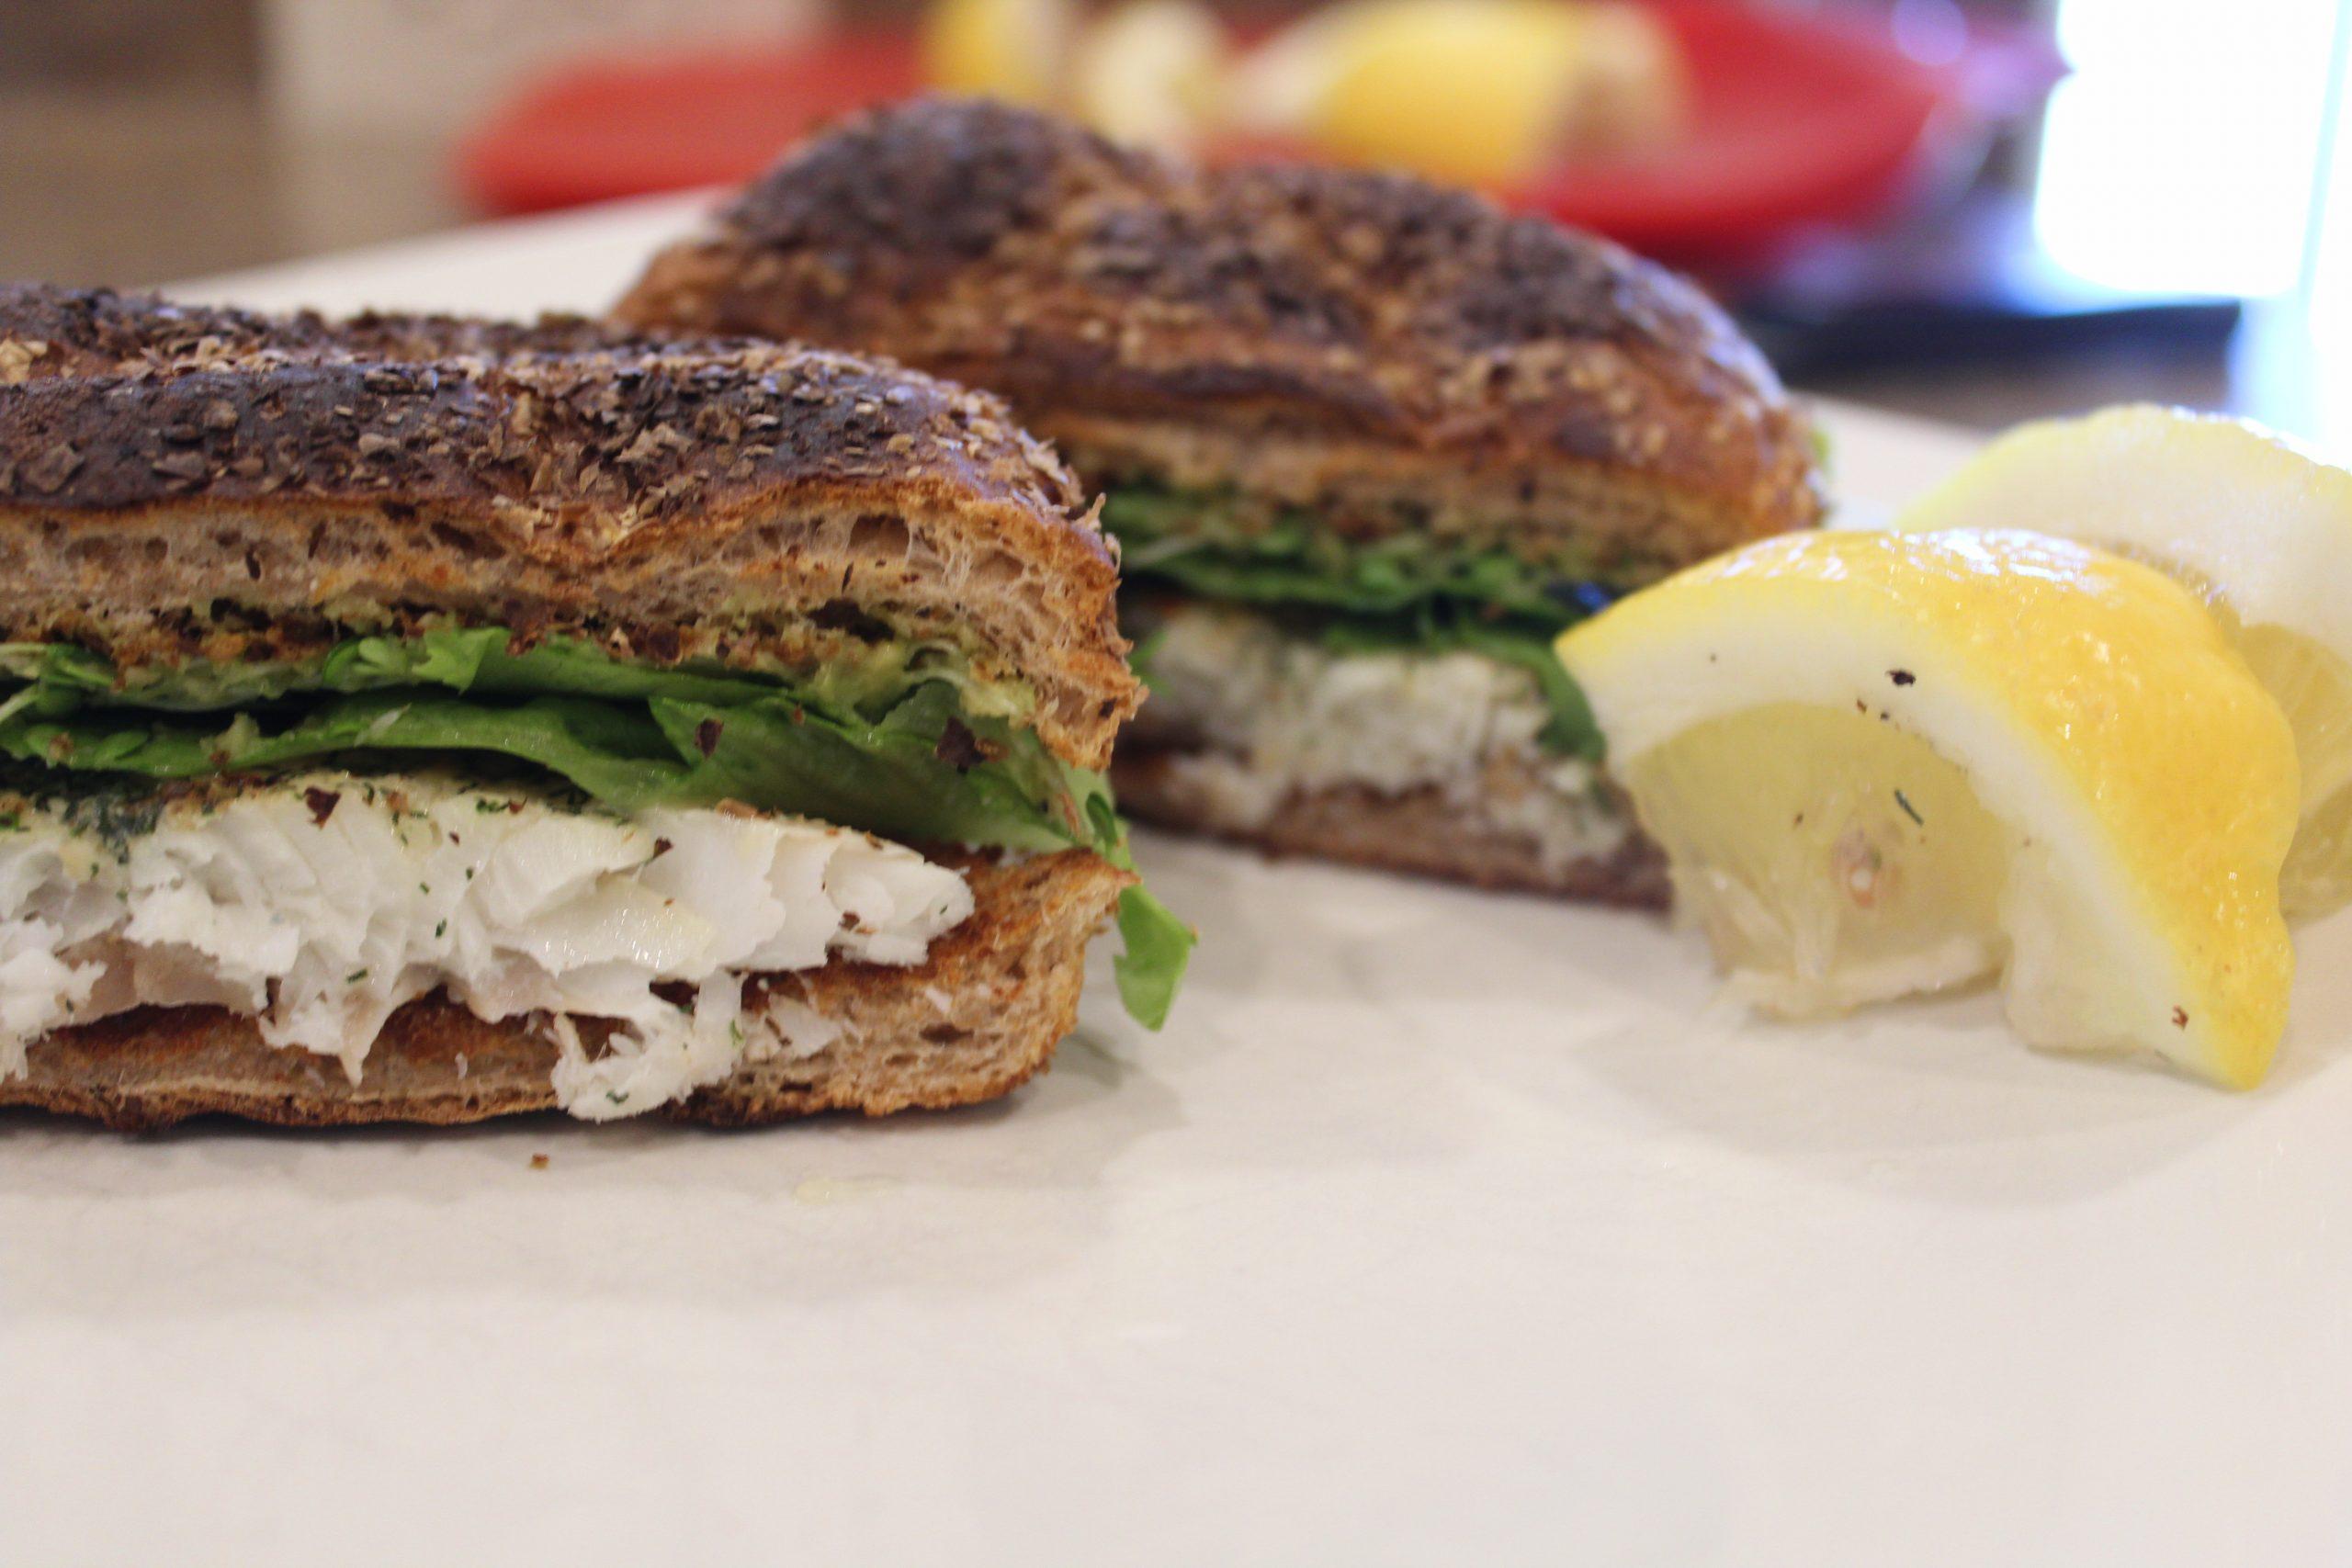 How to Make Alaskan Cod Burgers